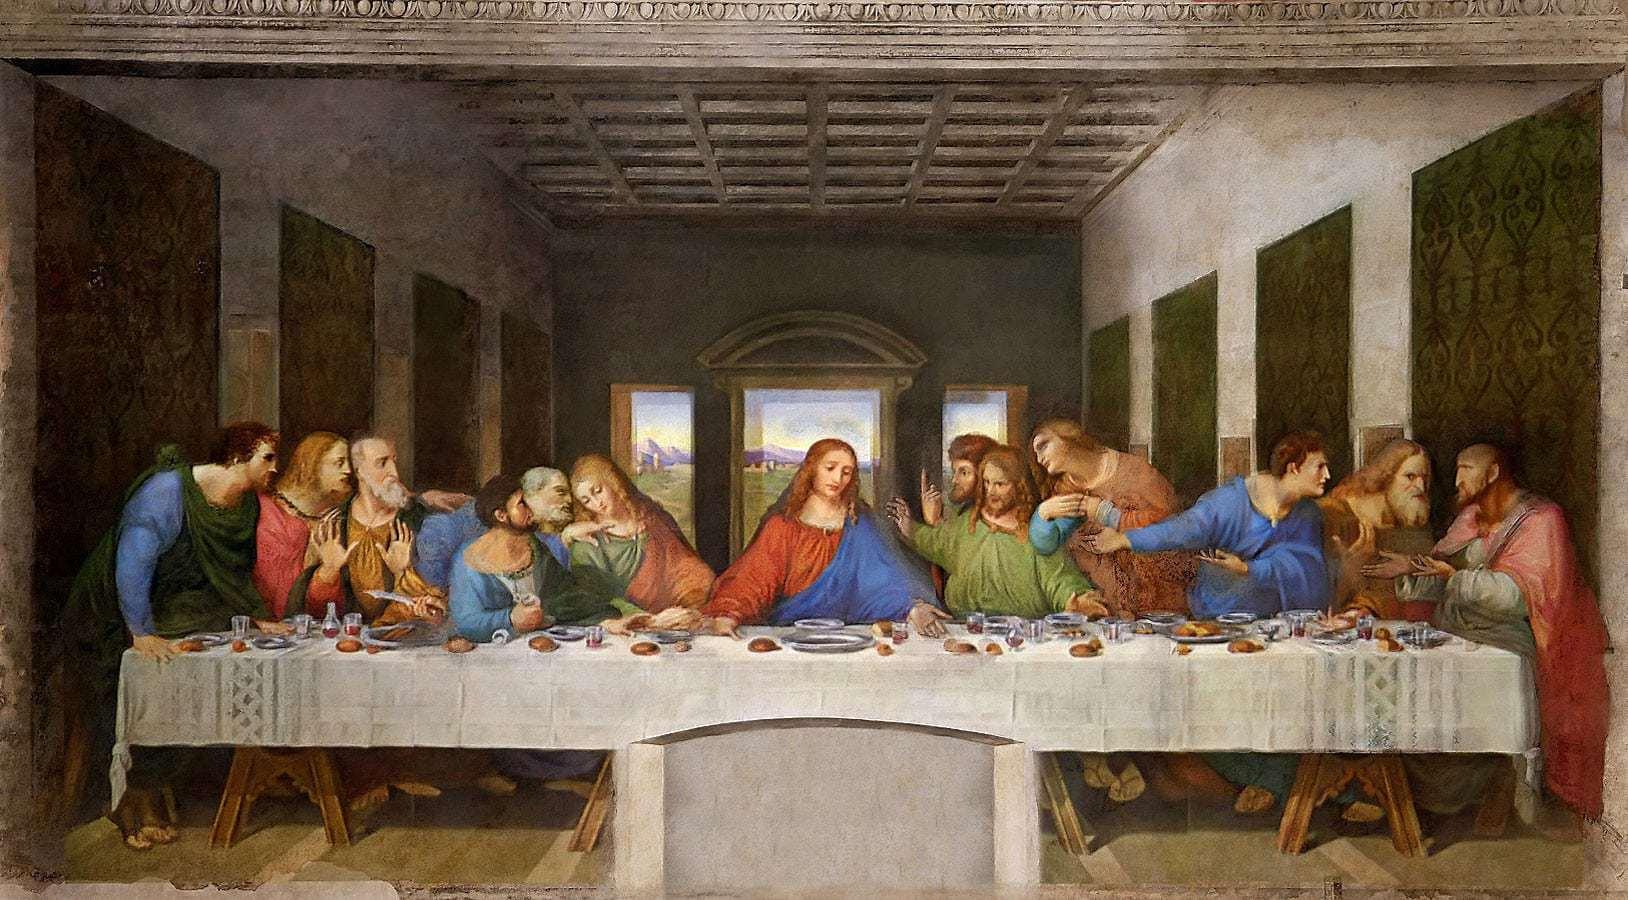 Leonardo%20da%20Vinci%2C%20A%20Ceia%20(pintura%20mural%2C%201494-1498)%2C%20Igreja%20de%20Santa%20Maria%20das%20Gra%C3%A7as%2C%20Mil%C3%A3o%2C%20It%C3%A1lia